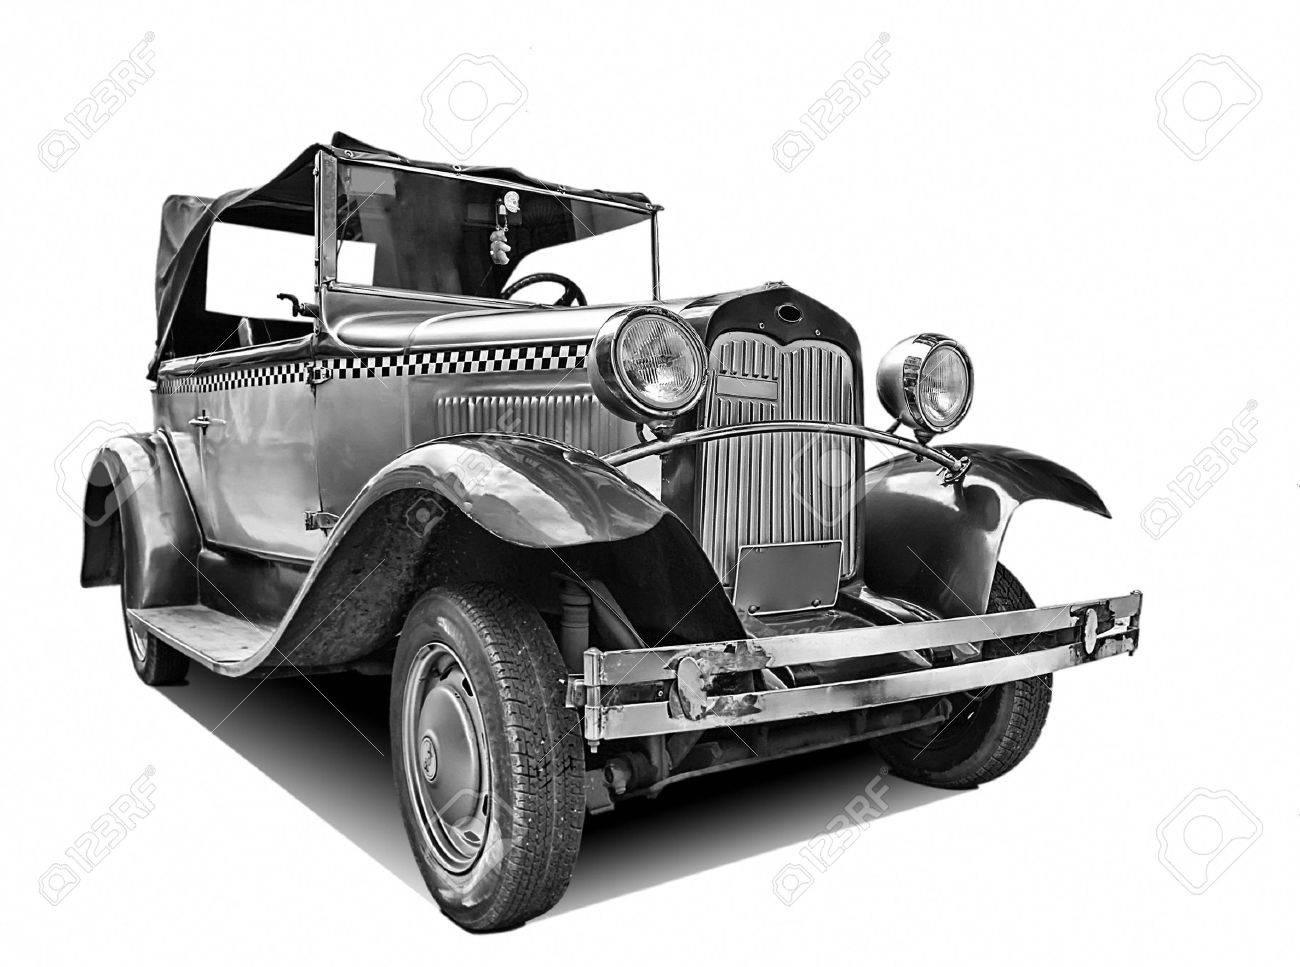 Oude Auto Foto Verzameling Van Autofoto S